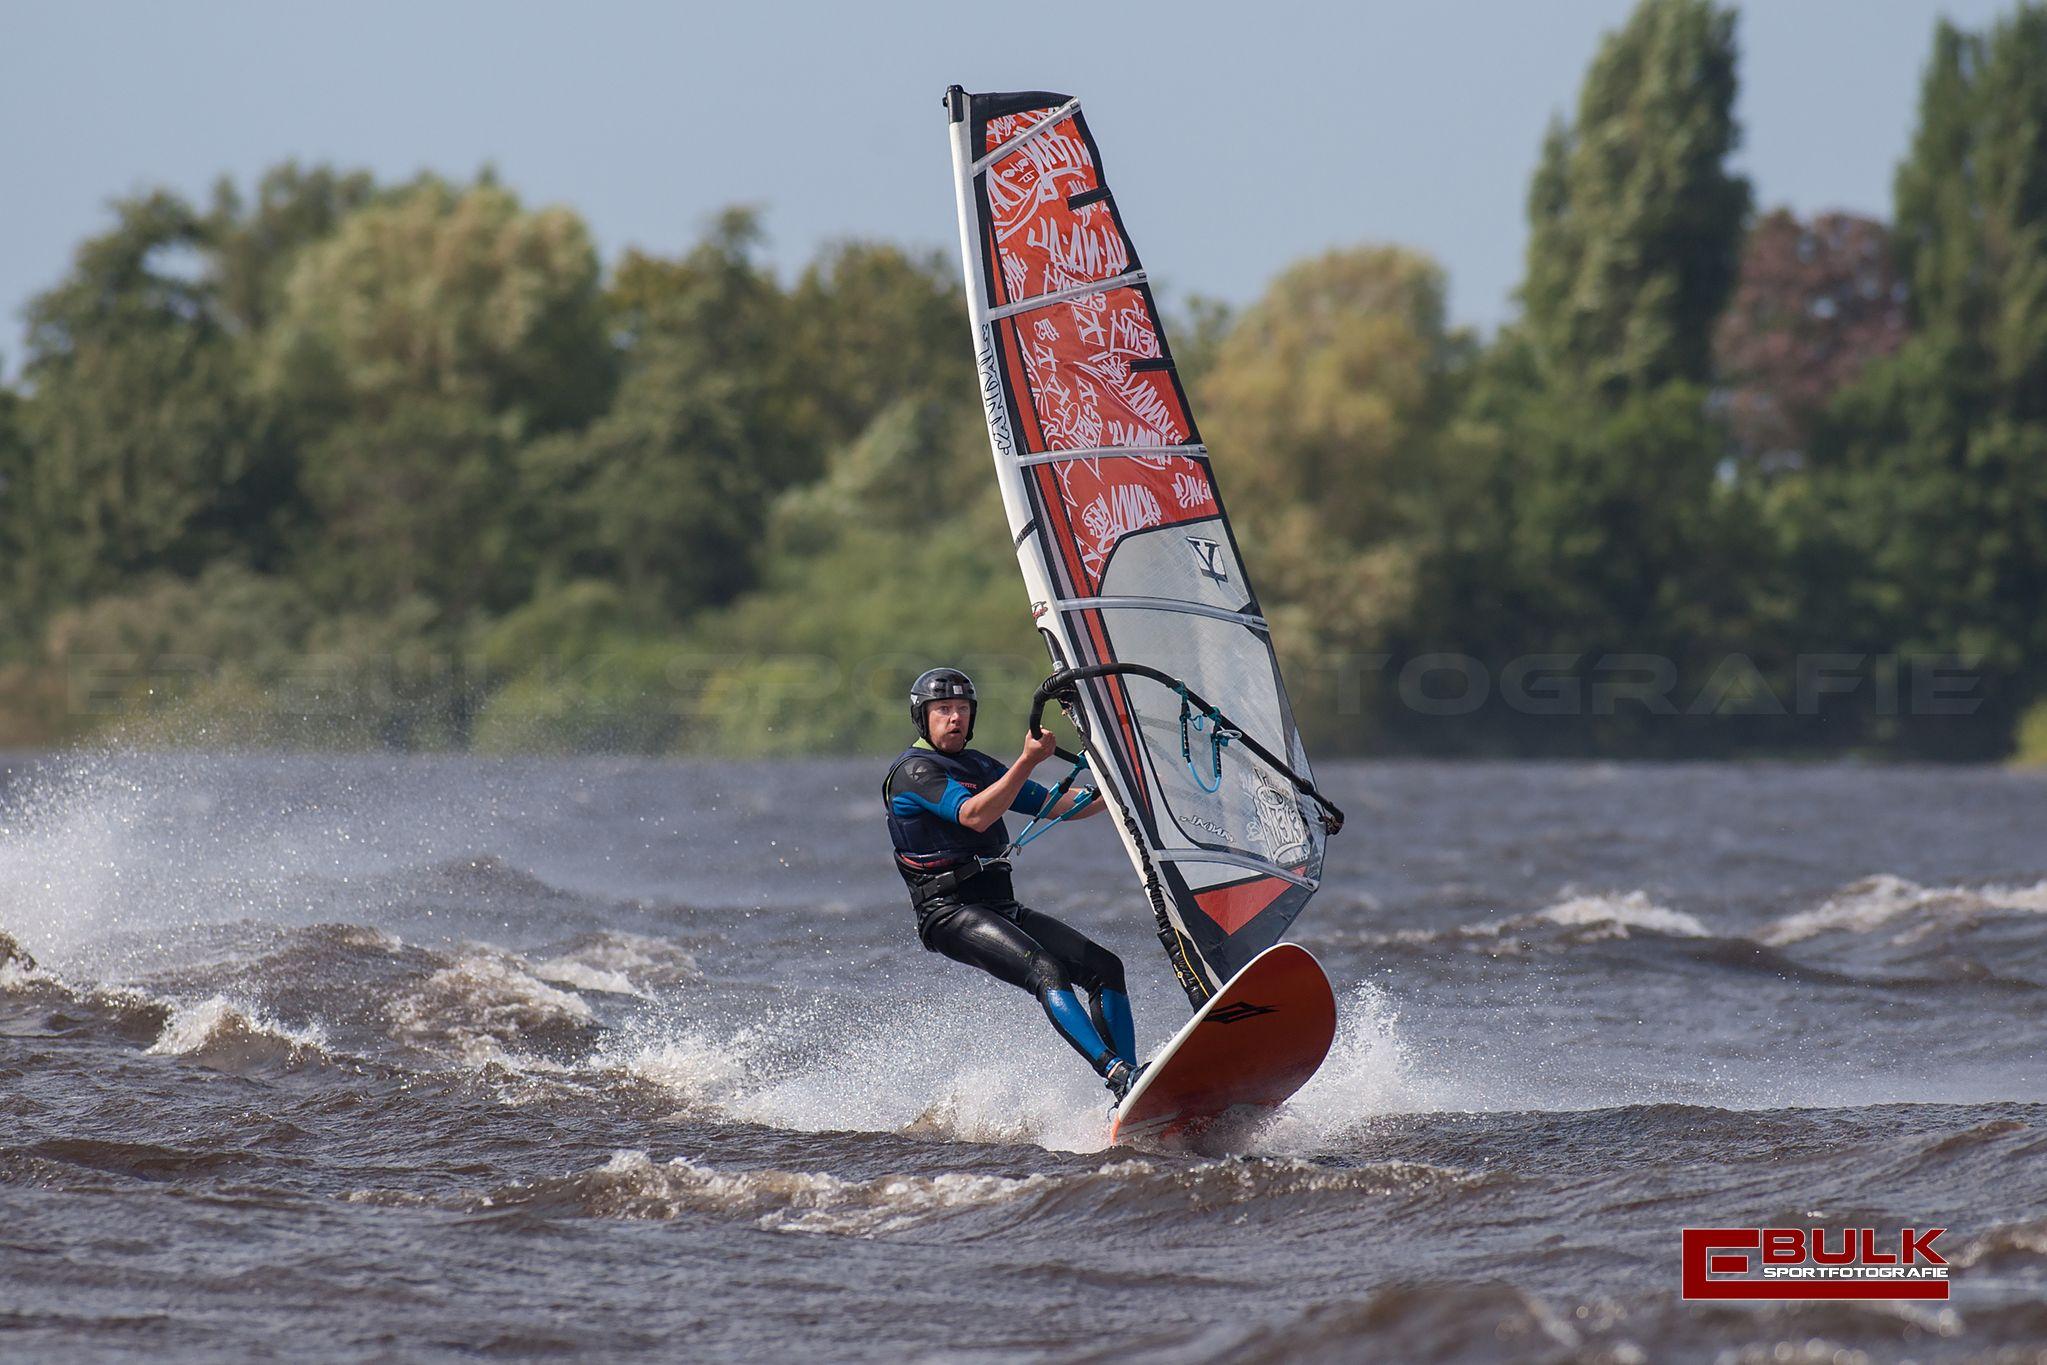 ebs_2769-ed_bulk_sportfotografie